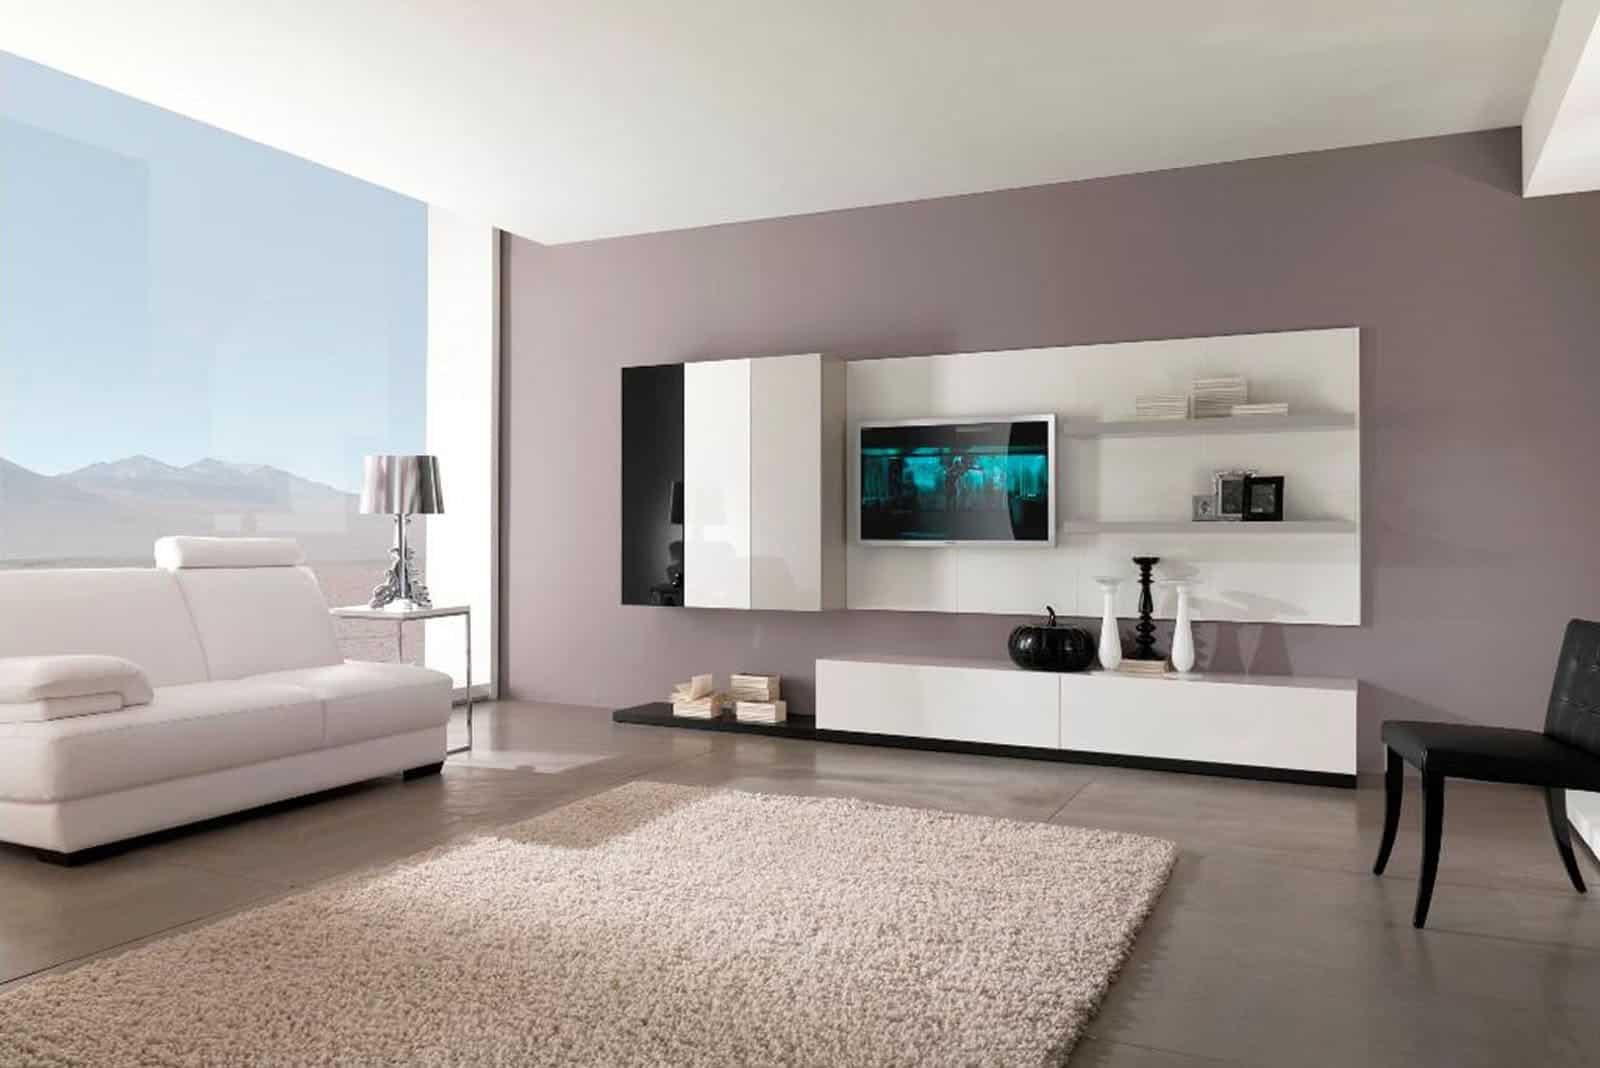 Modelos De Sala De Estar Pequena Simples Decorada 105 Fotos  -> Lustre Para Sala De Tv